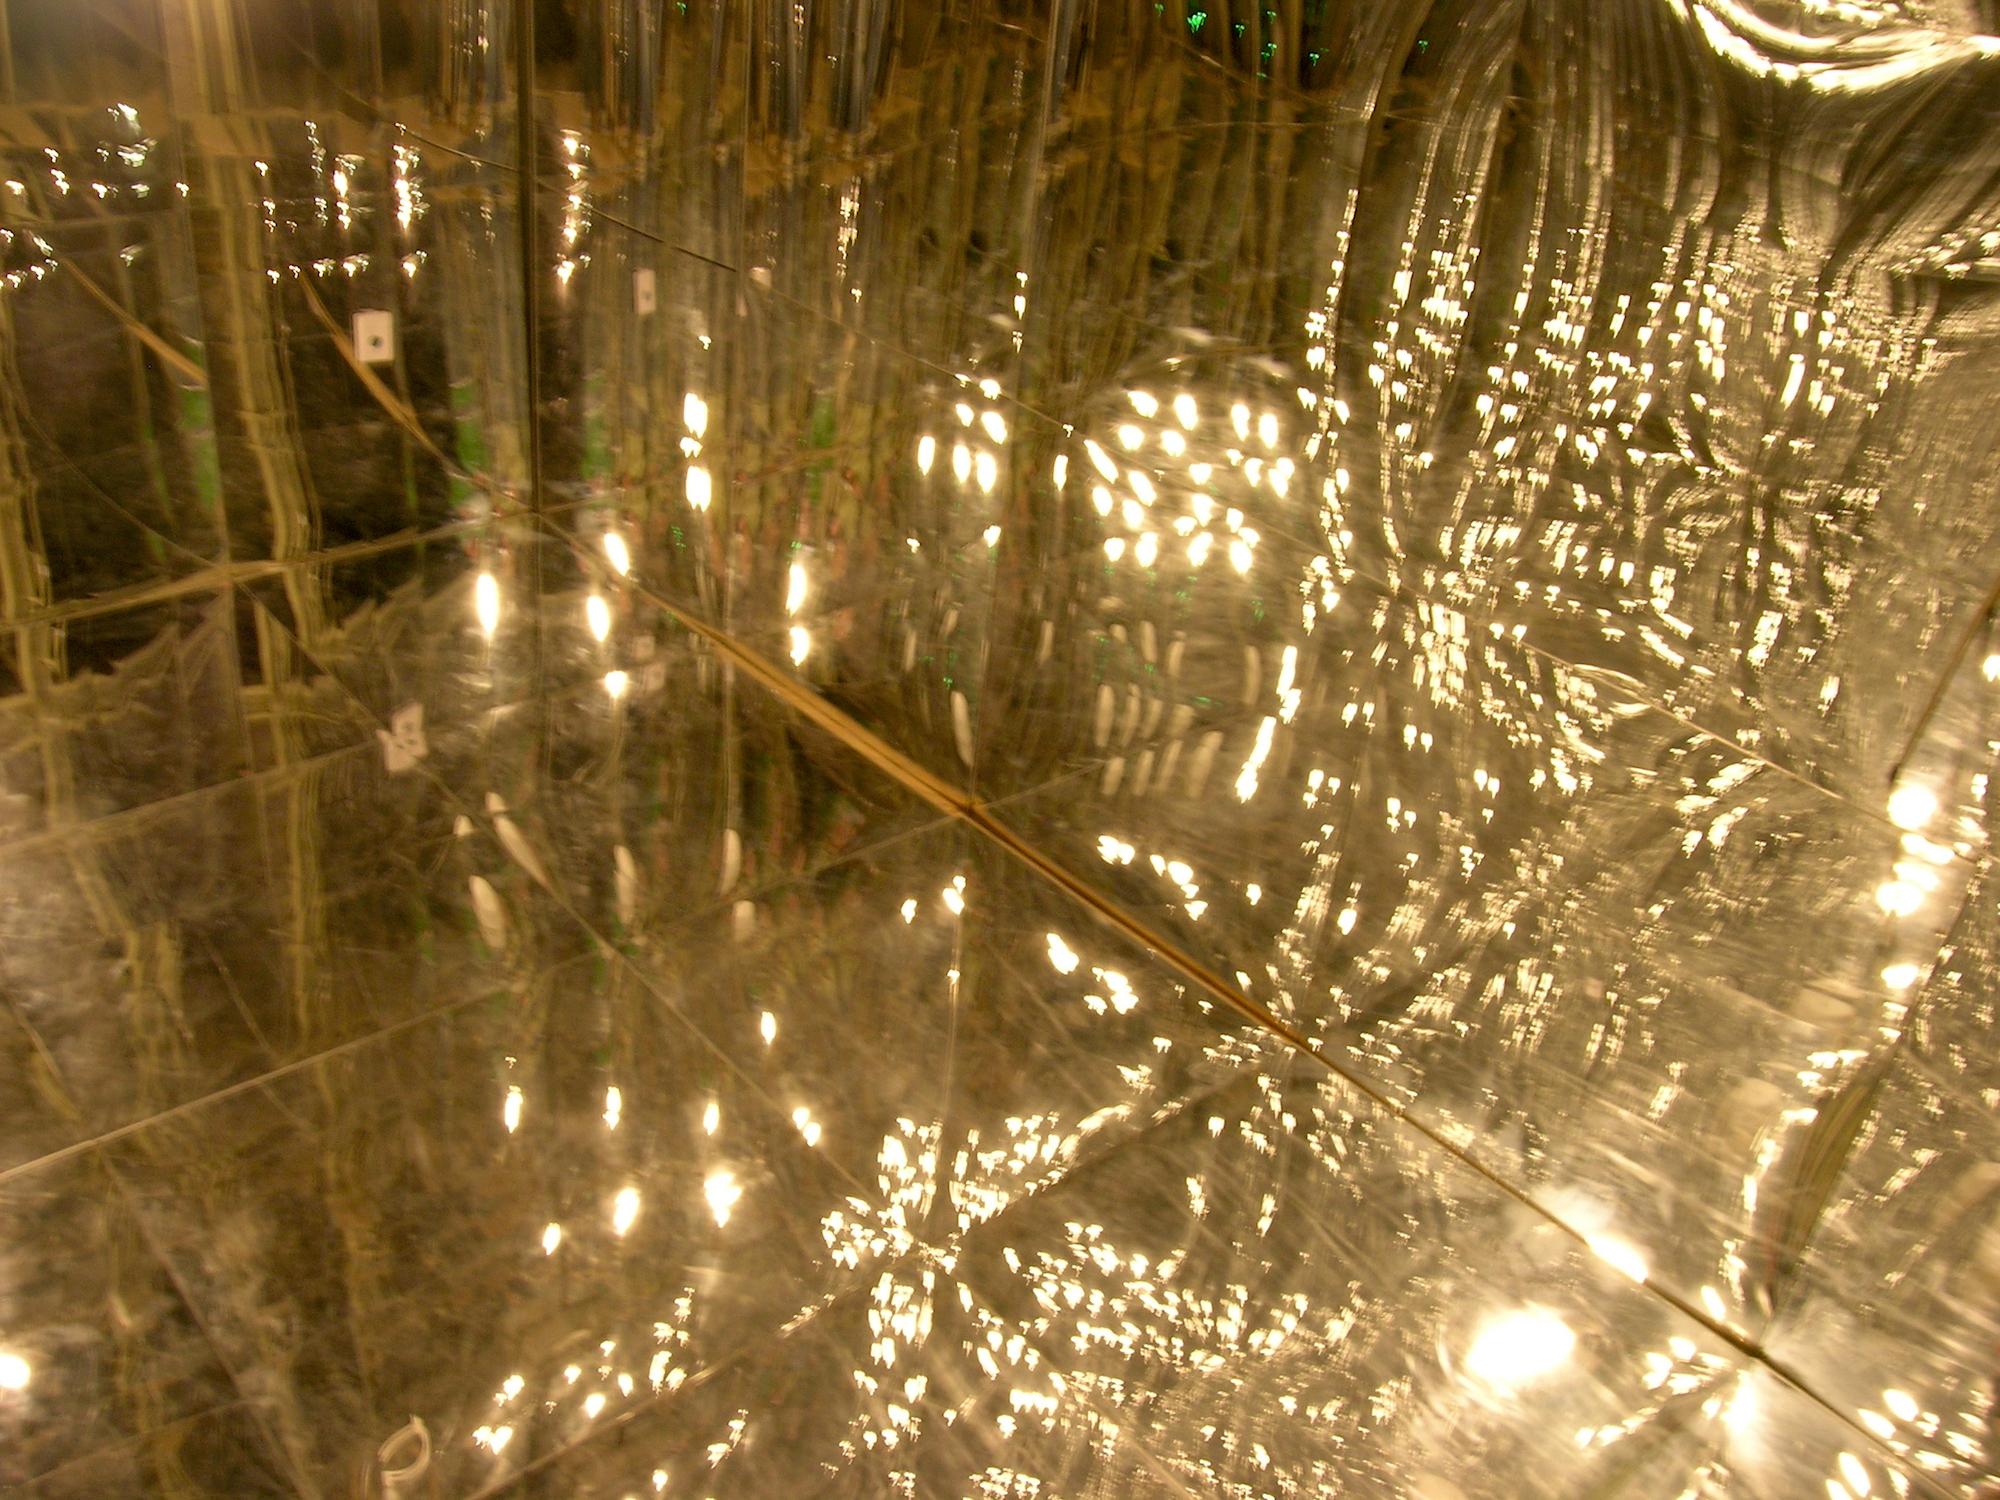 eleanor-bell-light-artist-infinity-reflections-cornwall-design-season.jpg